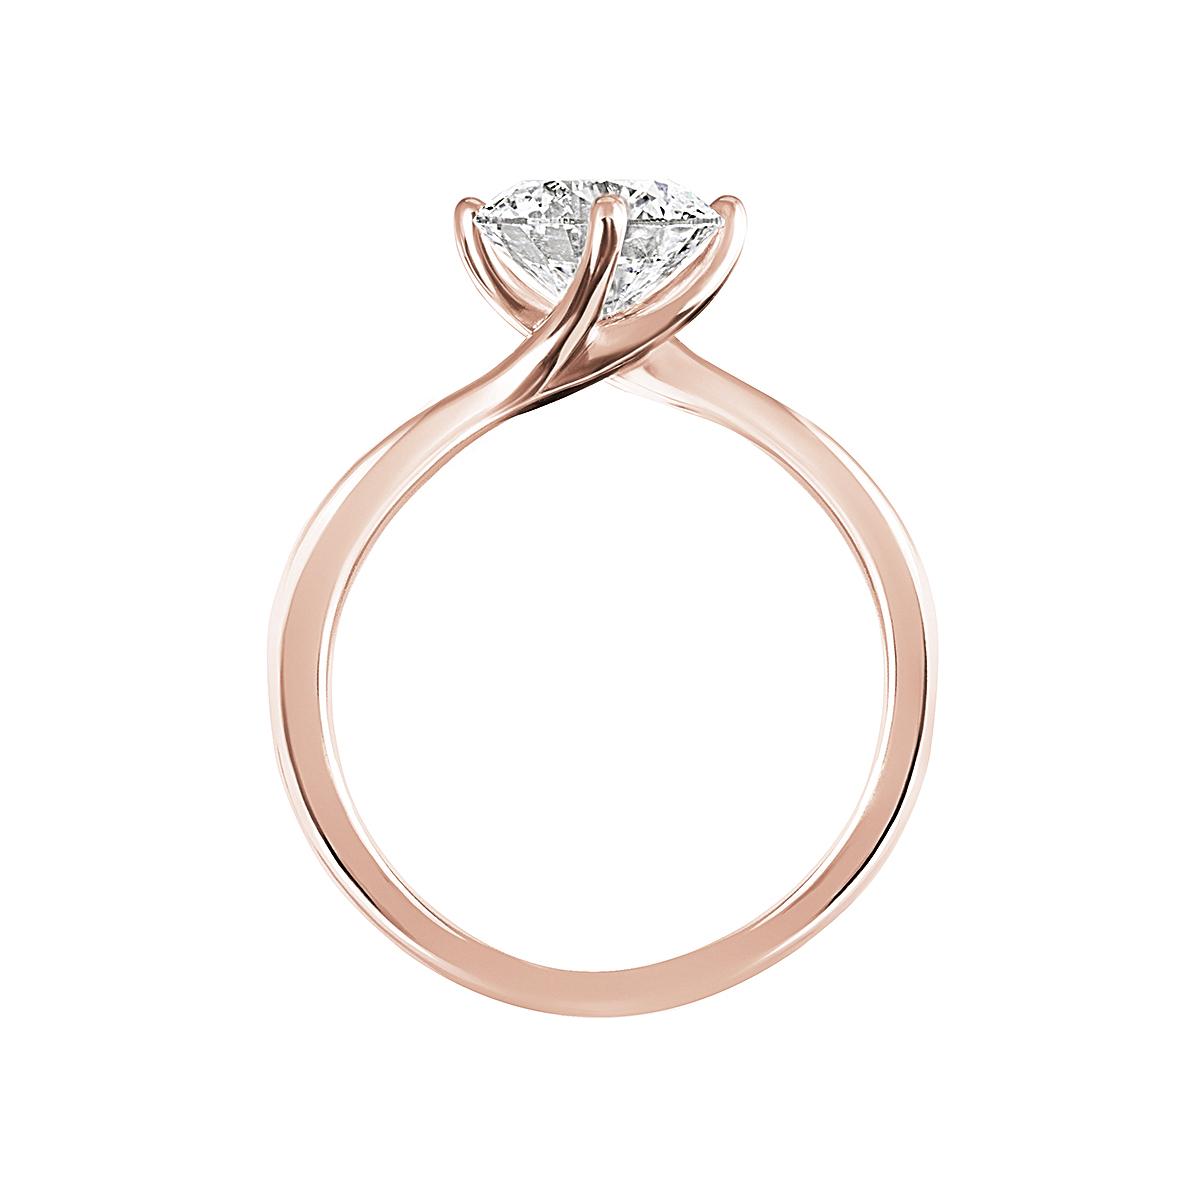 Grace-rose-gold-solitaire-diamond-engagement-ring-profile.jpg